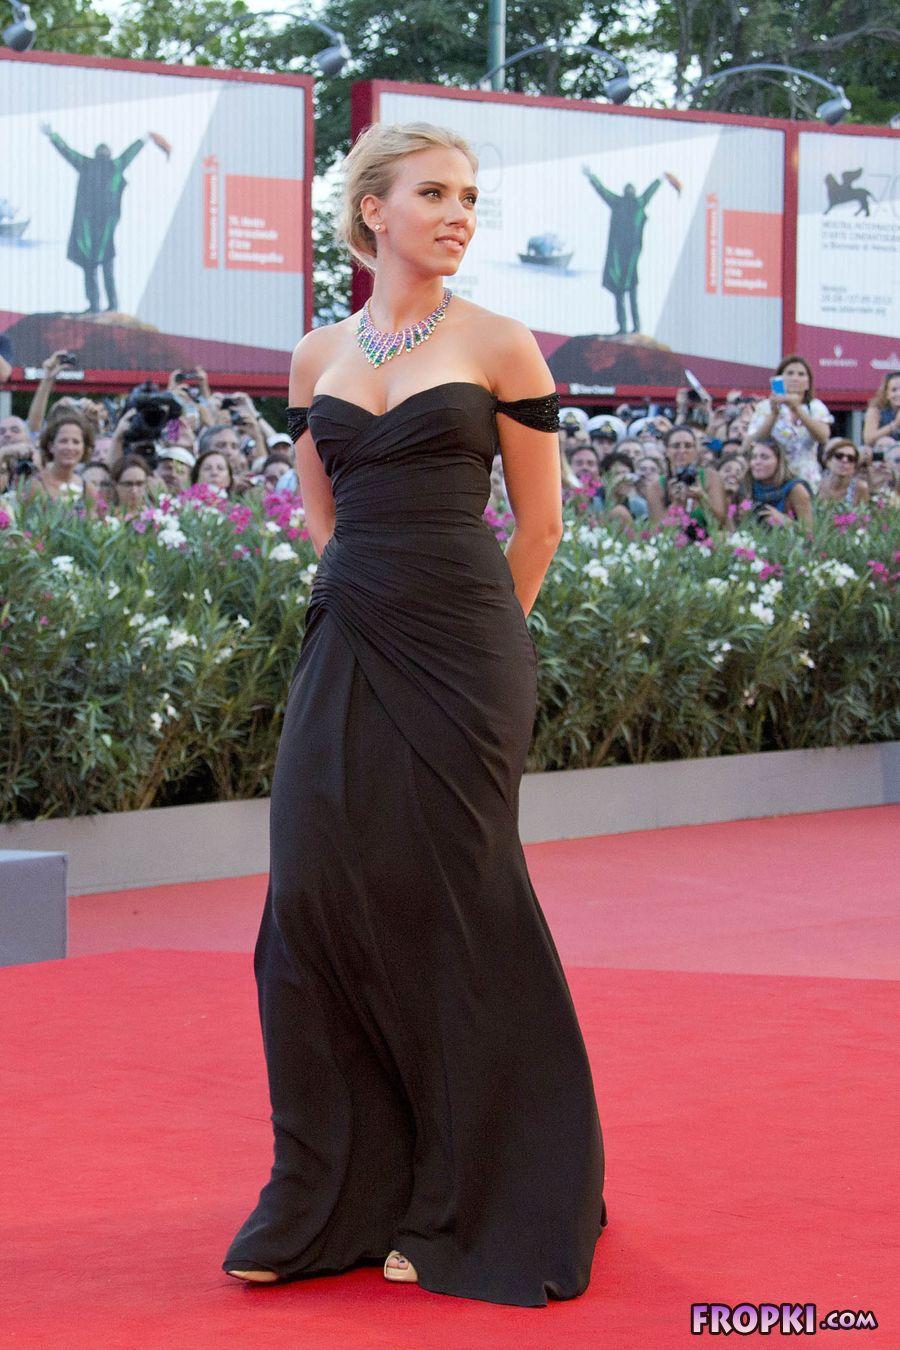 Scarlett Johansson Fropki 23